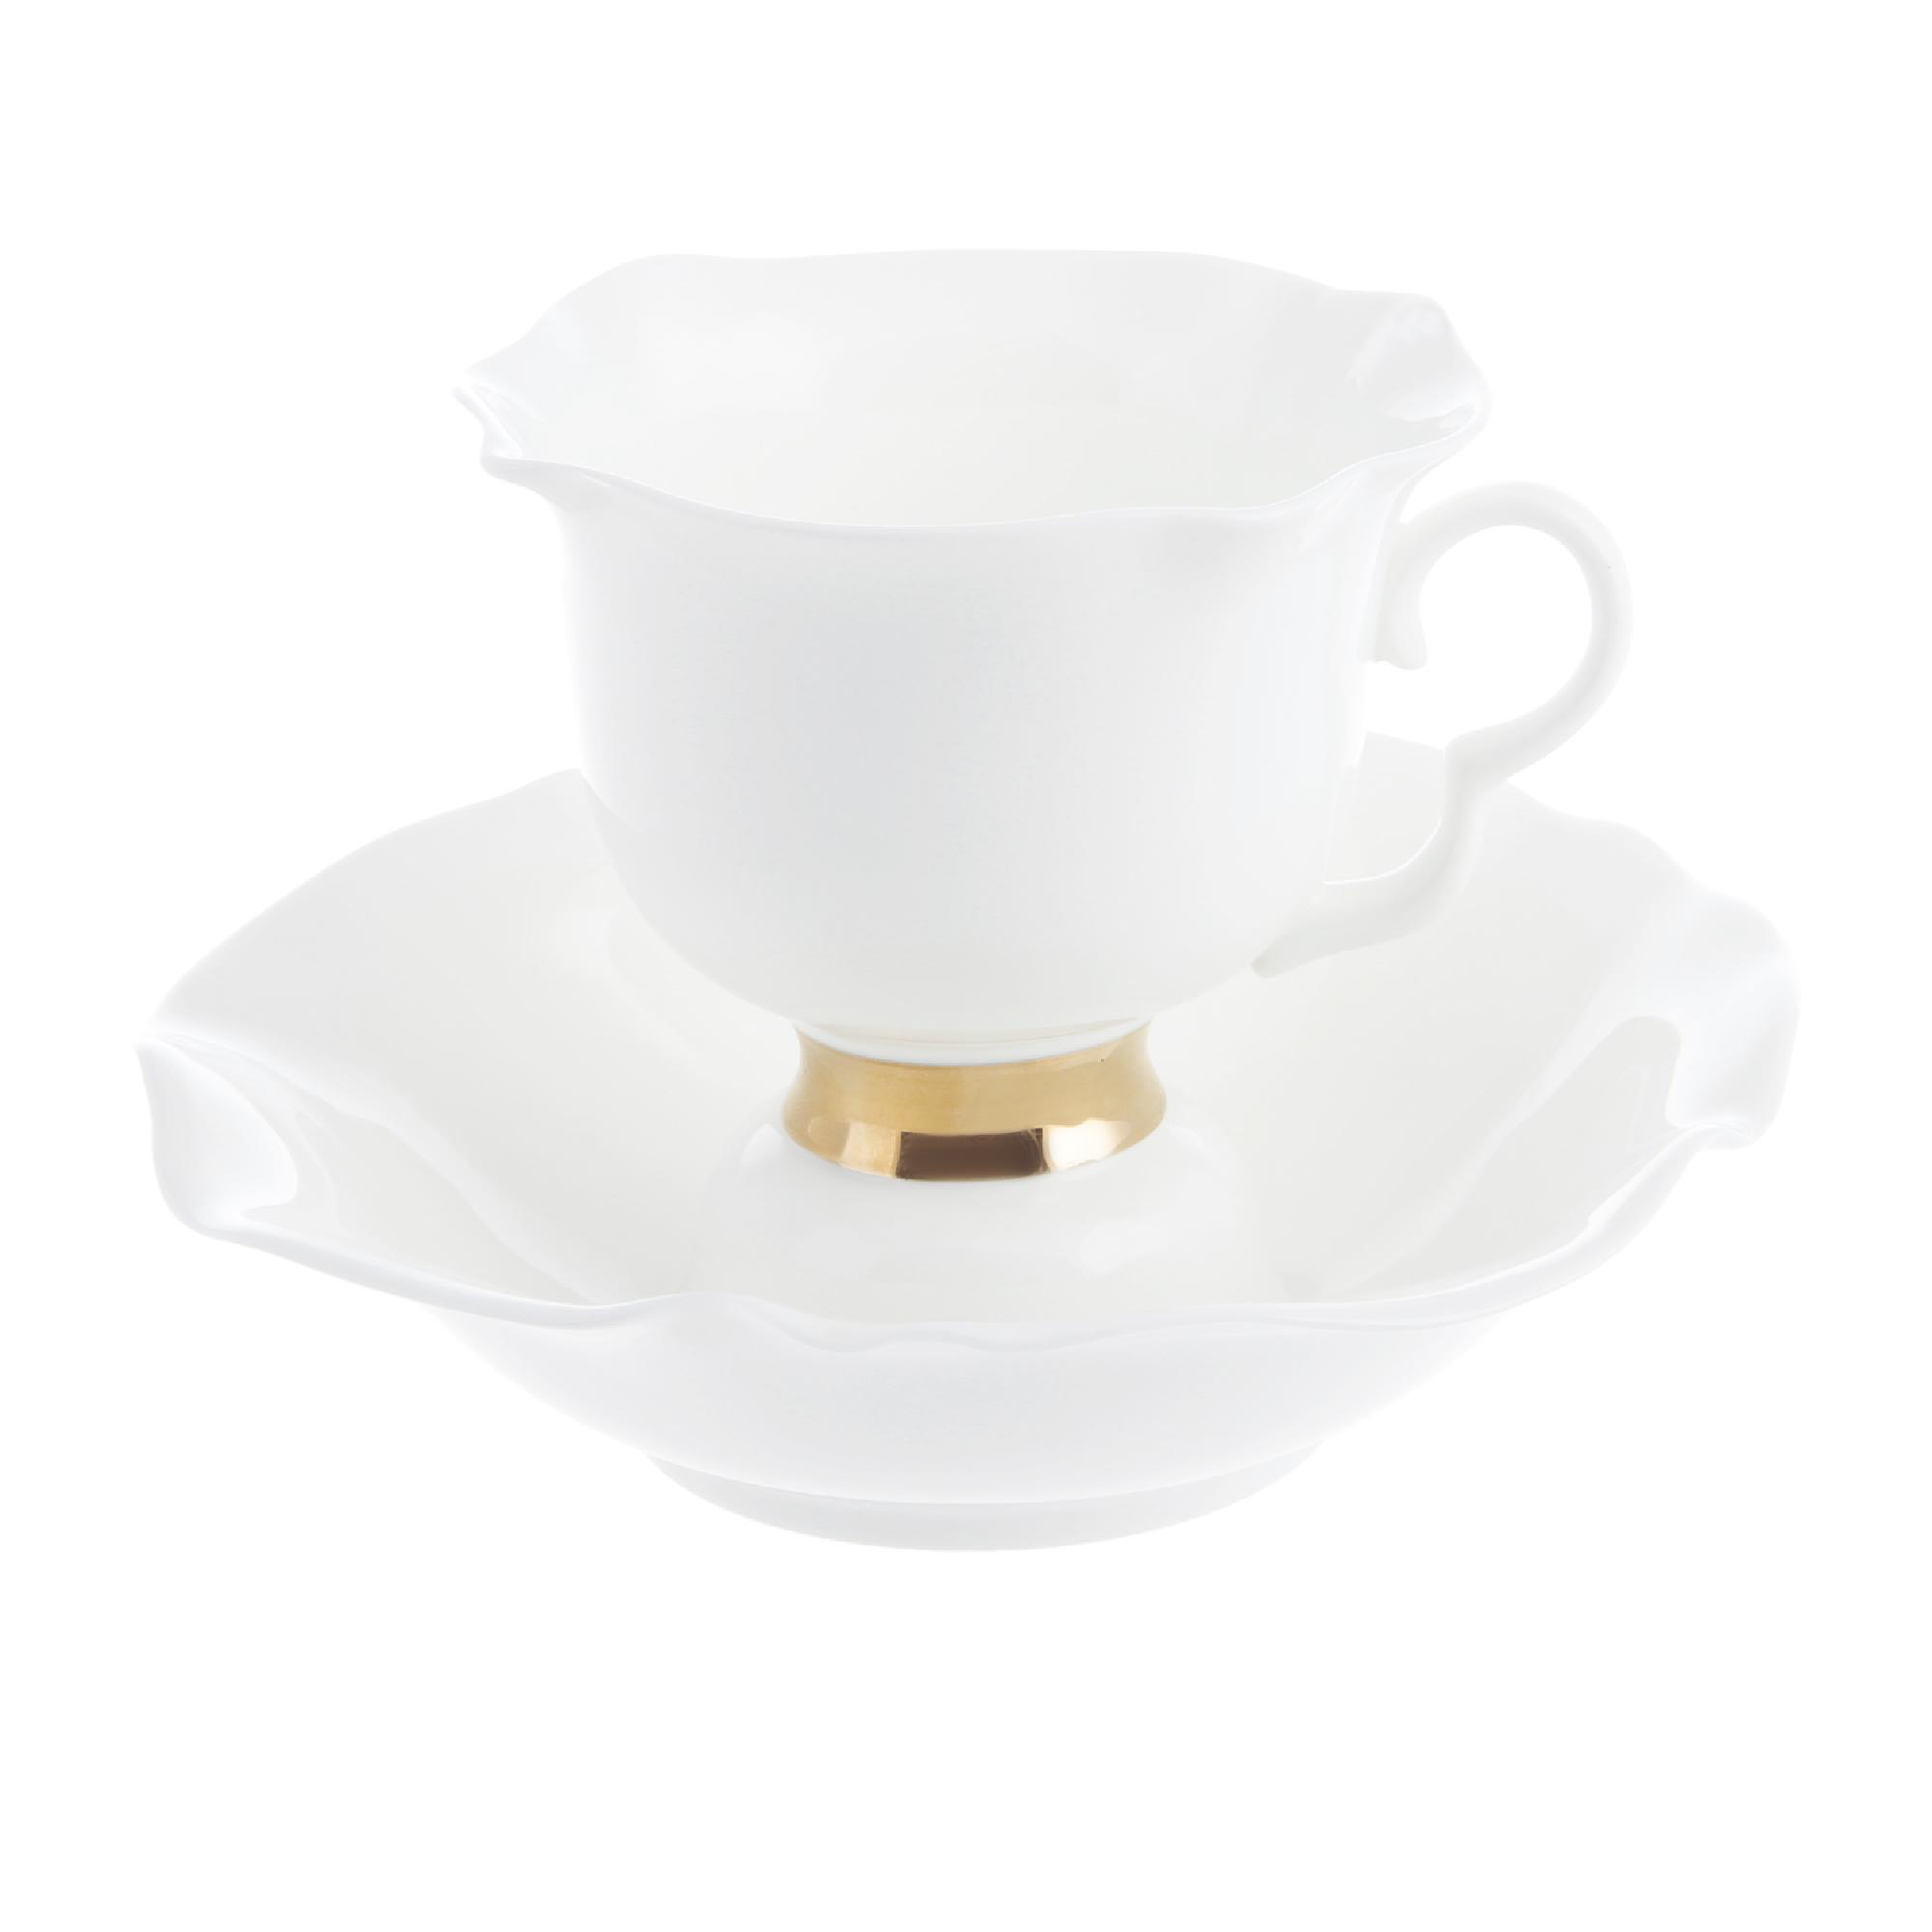 Чашка с блюдцем чайная ИФЗ 200 мл Белый цветок Золотая лента 200 мл